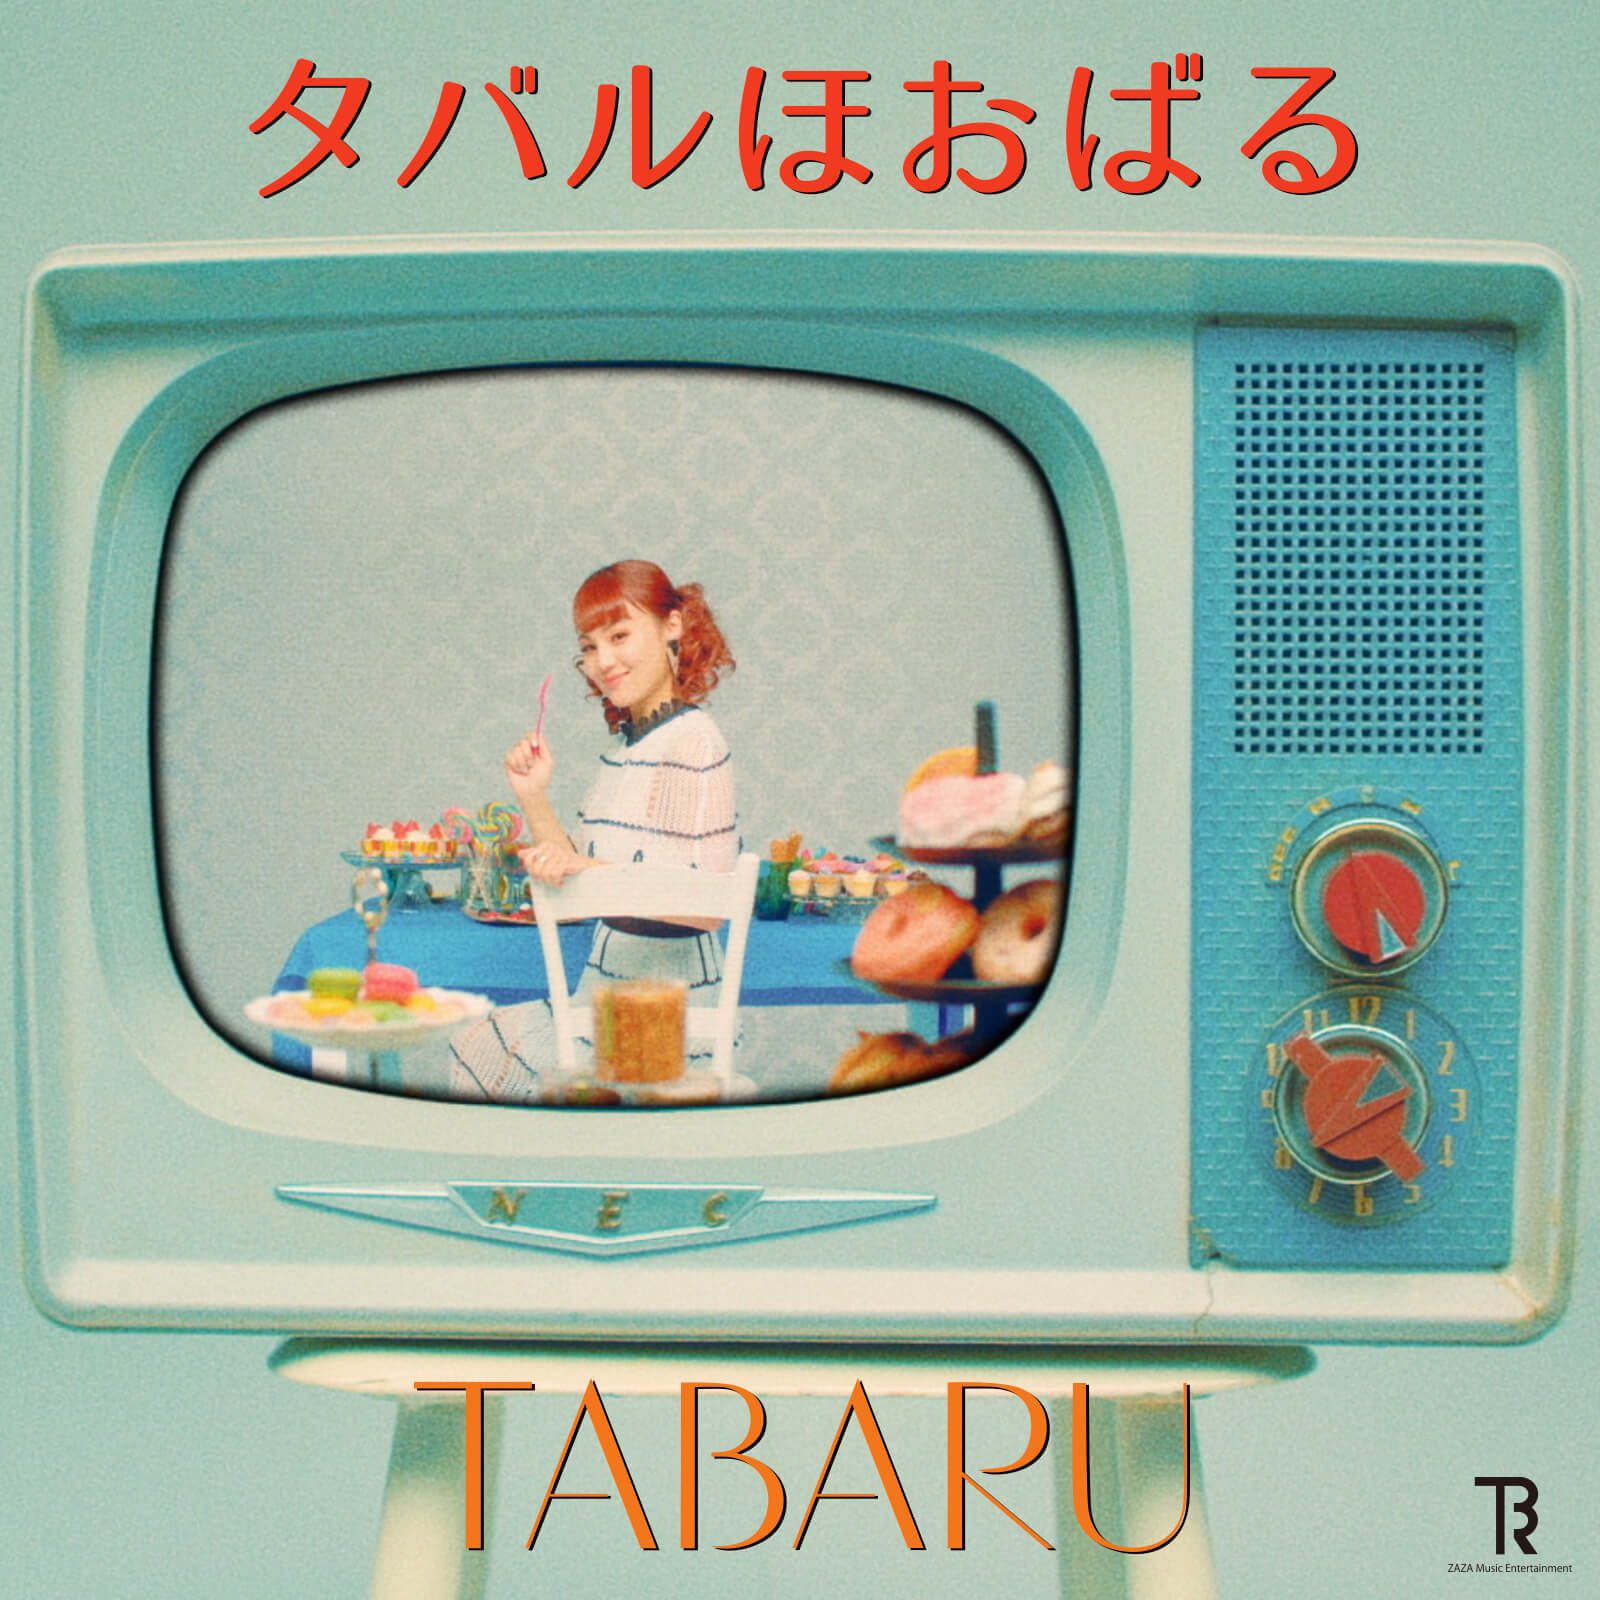 TABARUの新曲『タバルほおばる』配信スタート&MV公開サムネイル画像